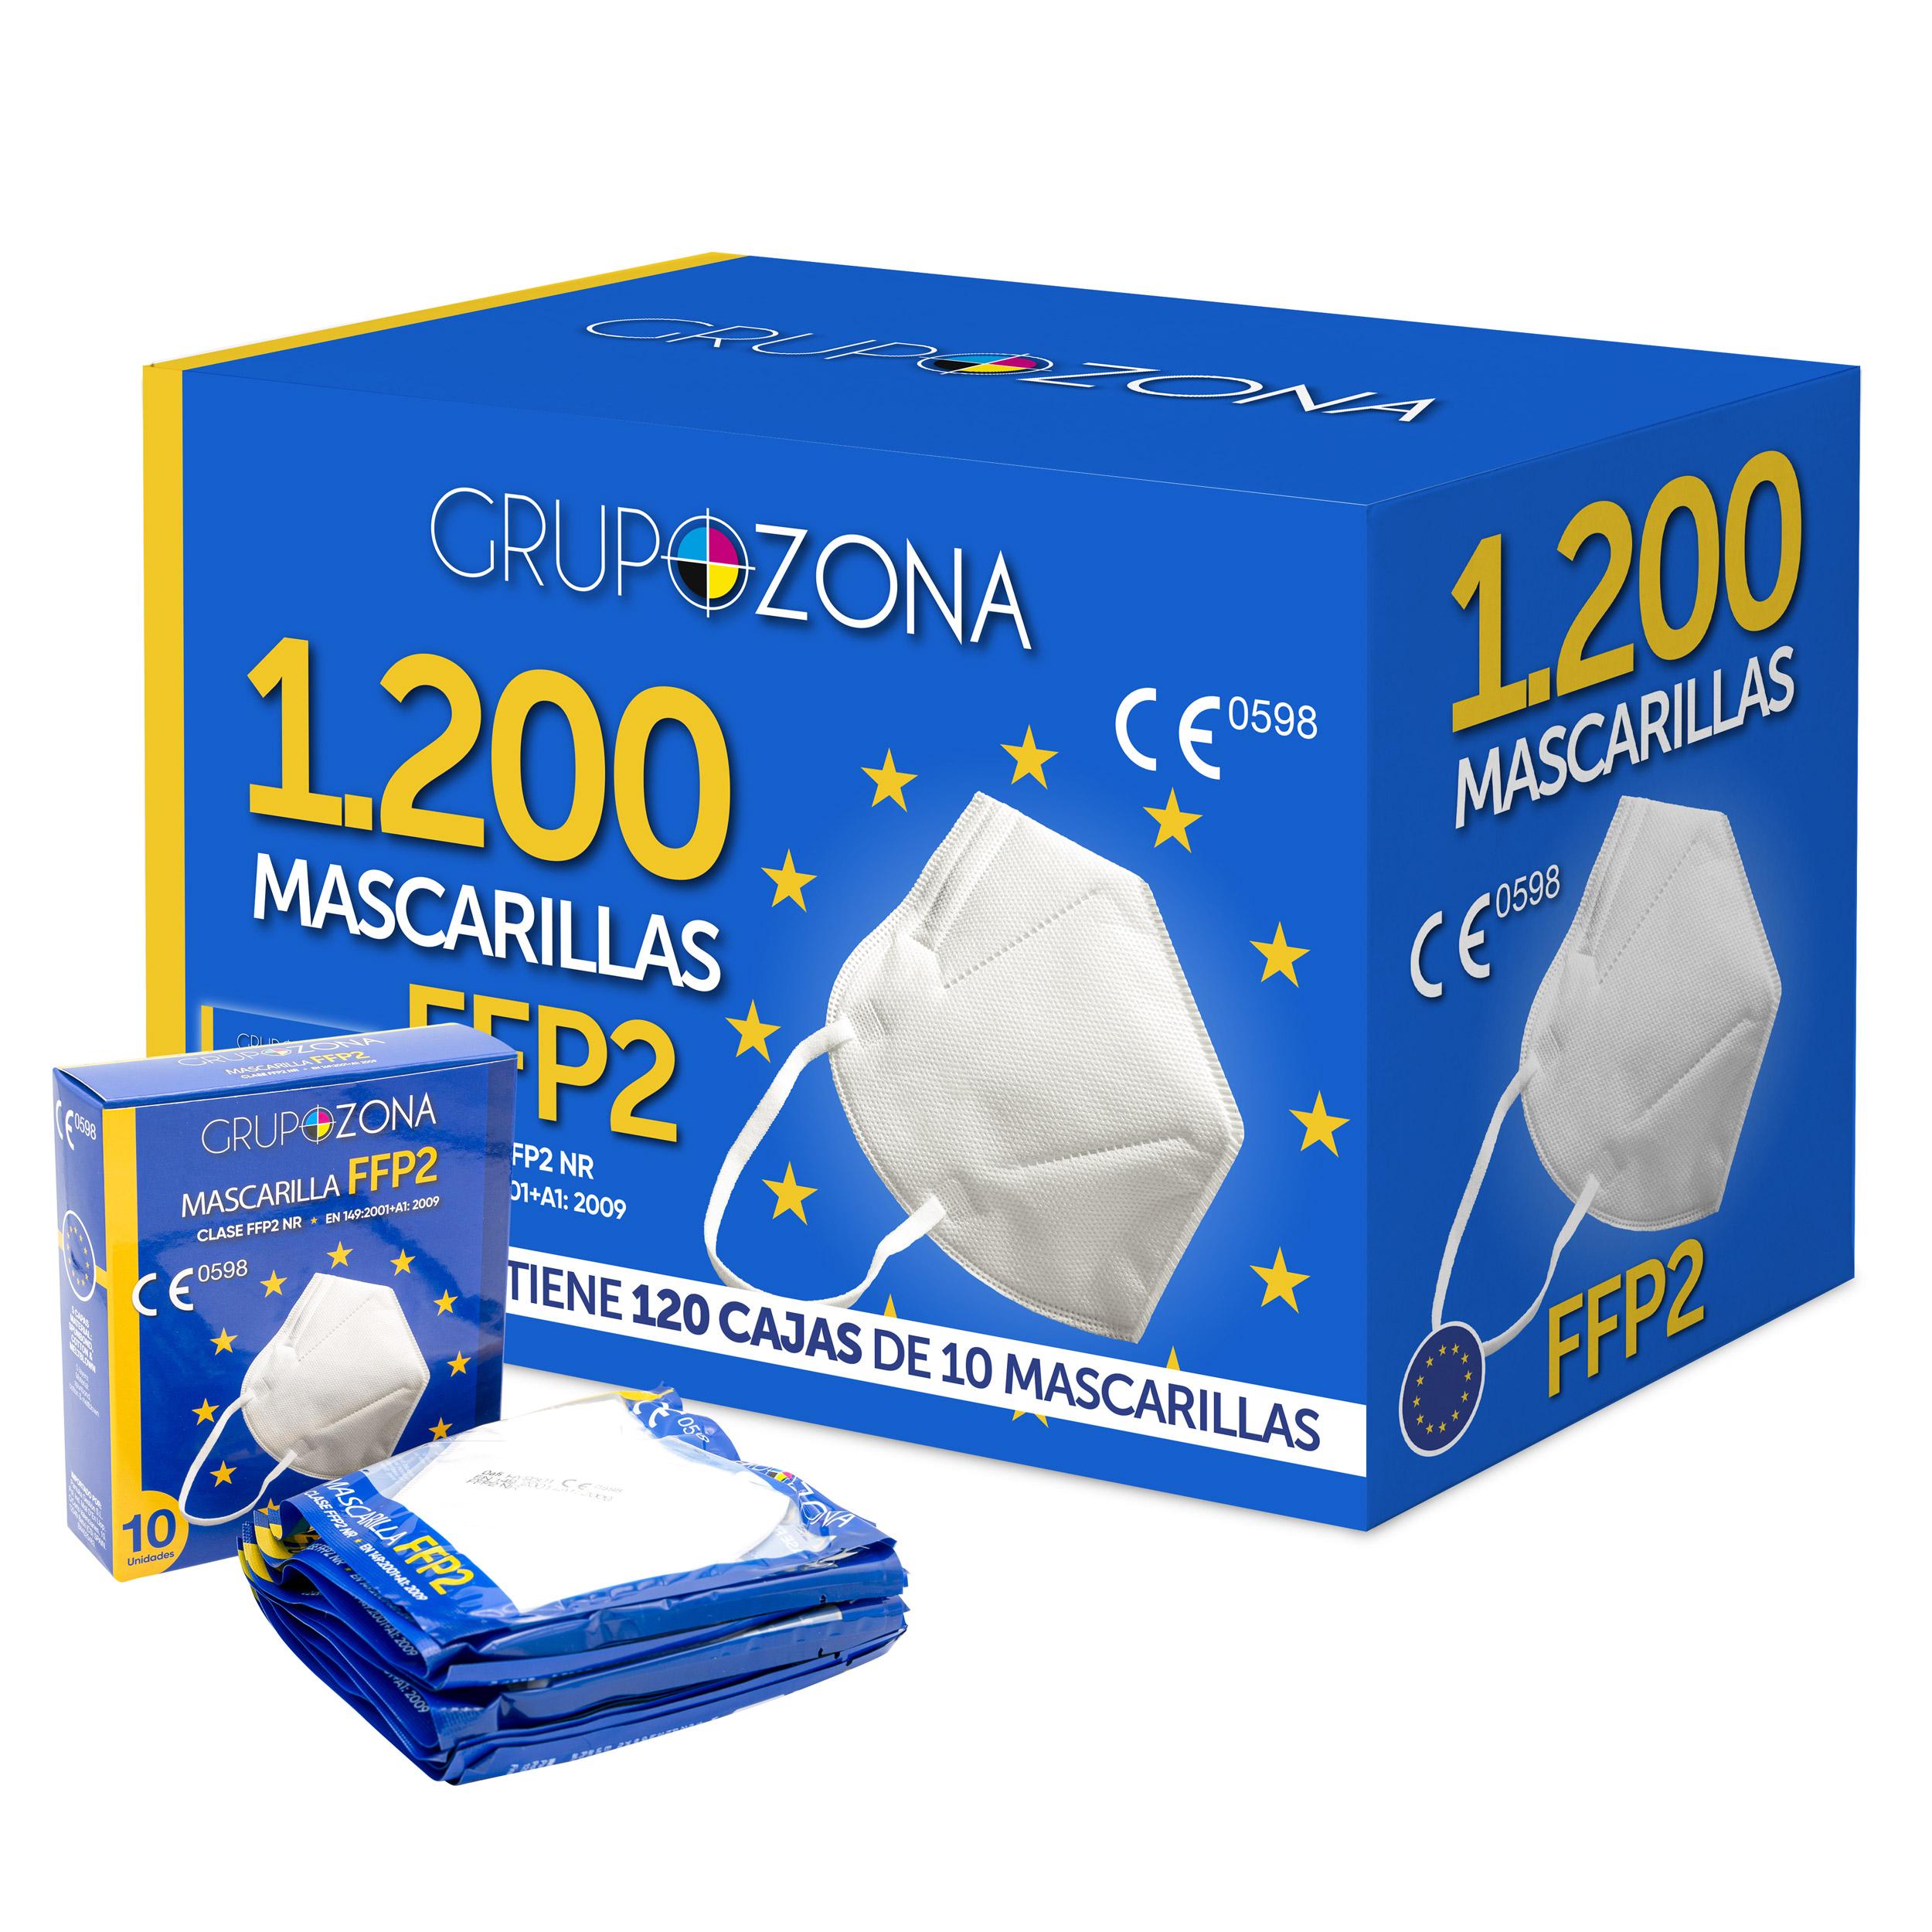 pack-1200-mascarillas-ffp2-grupozona-blancas